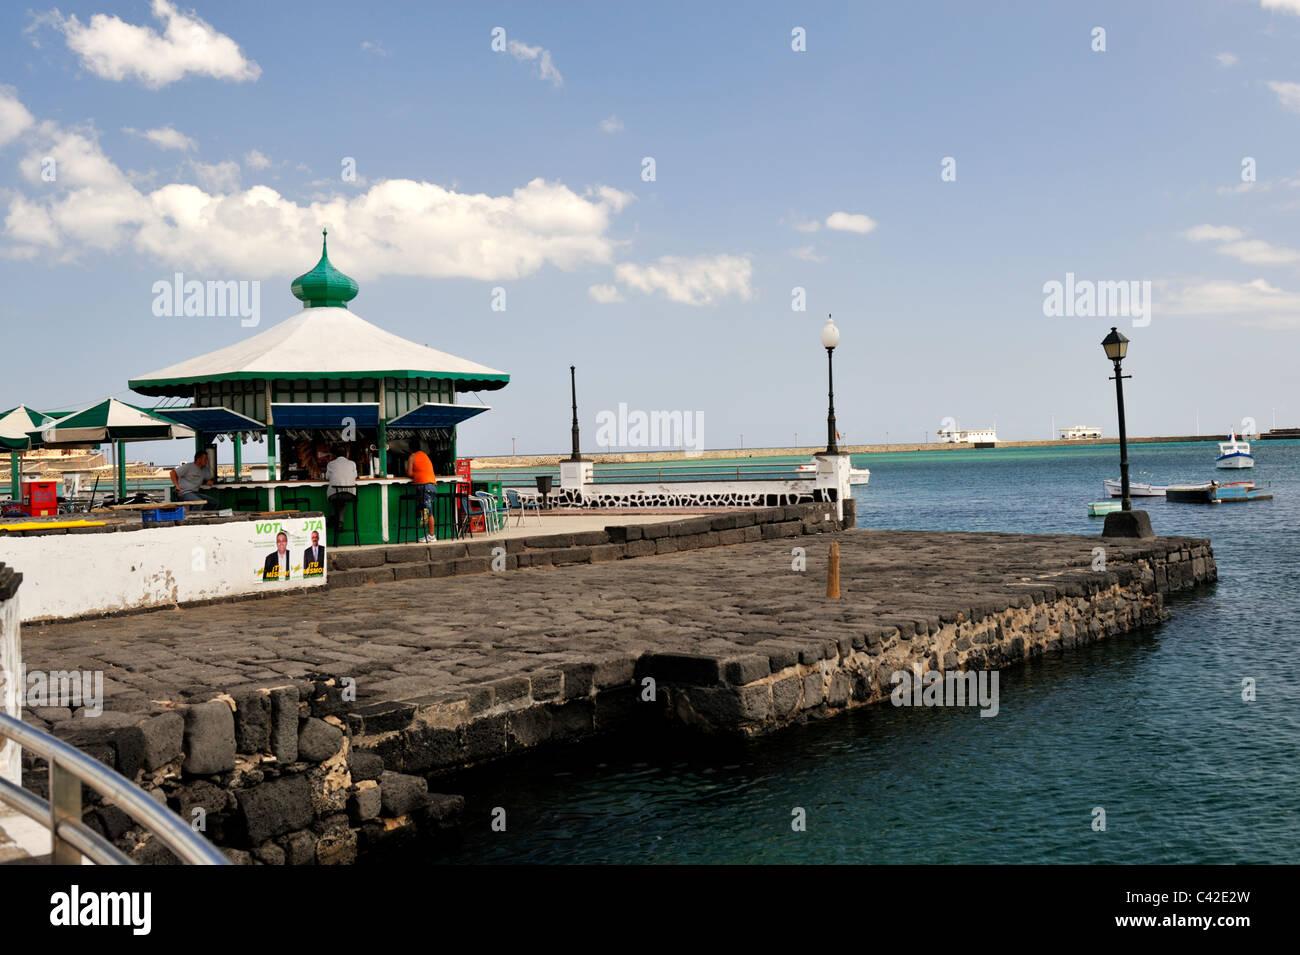 Seaside snack bar in harbour of Arrecife, Lanzarote, 'Canary Islands' - Stock Image